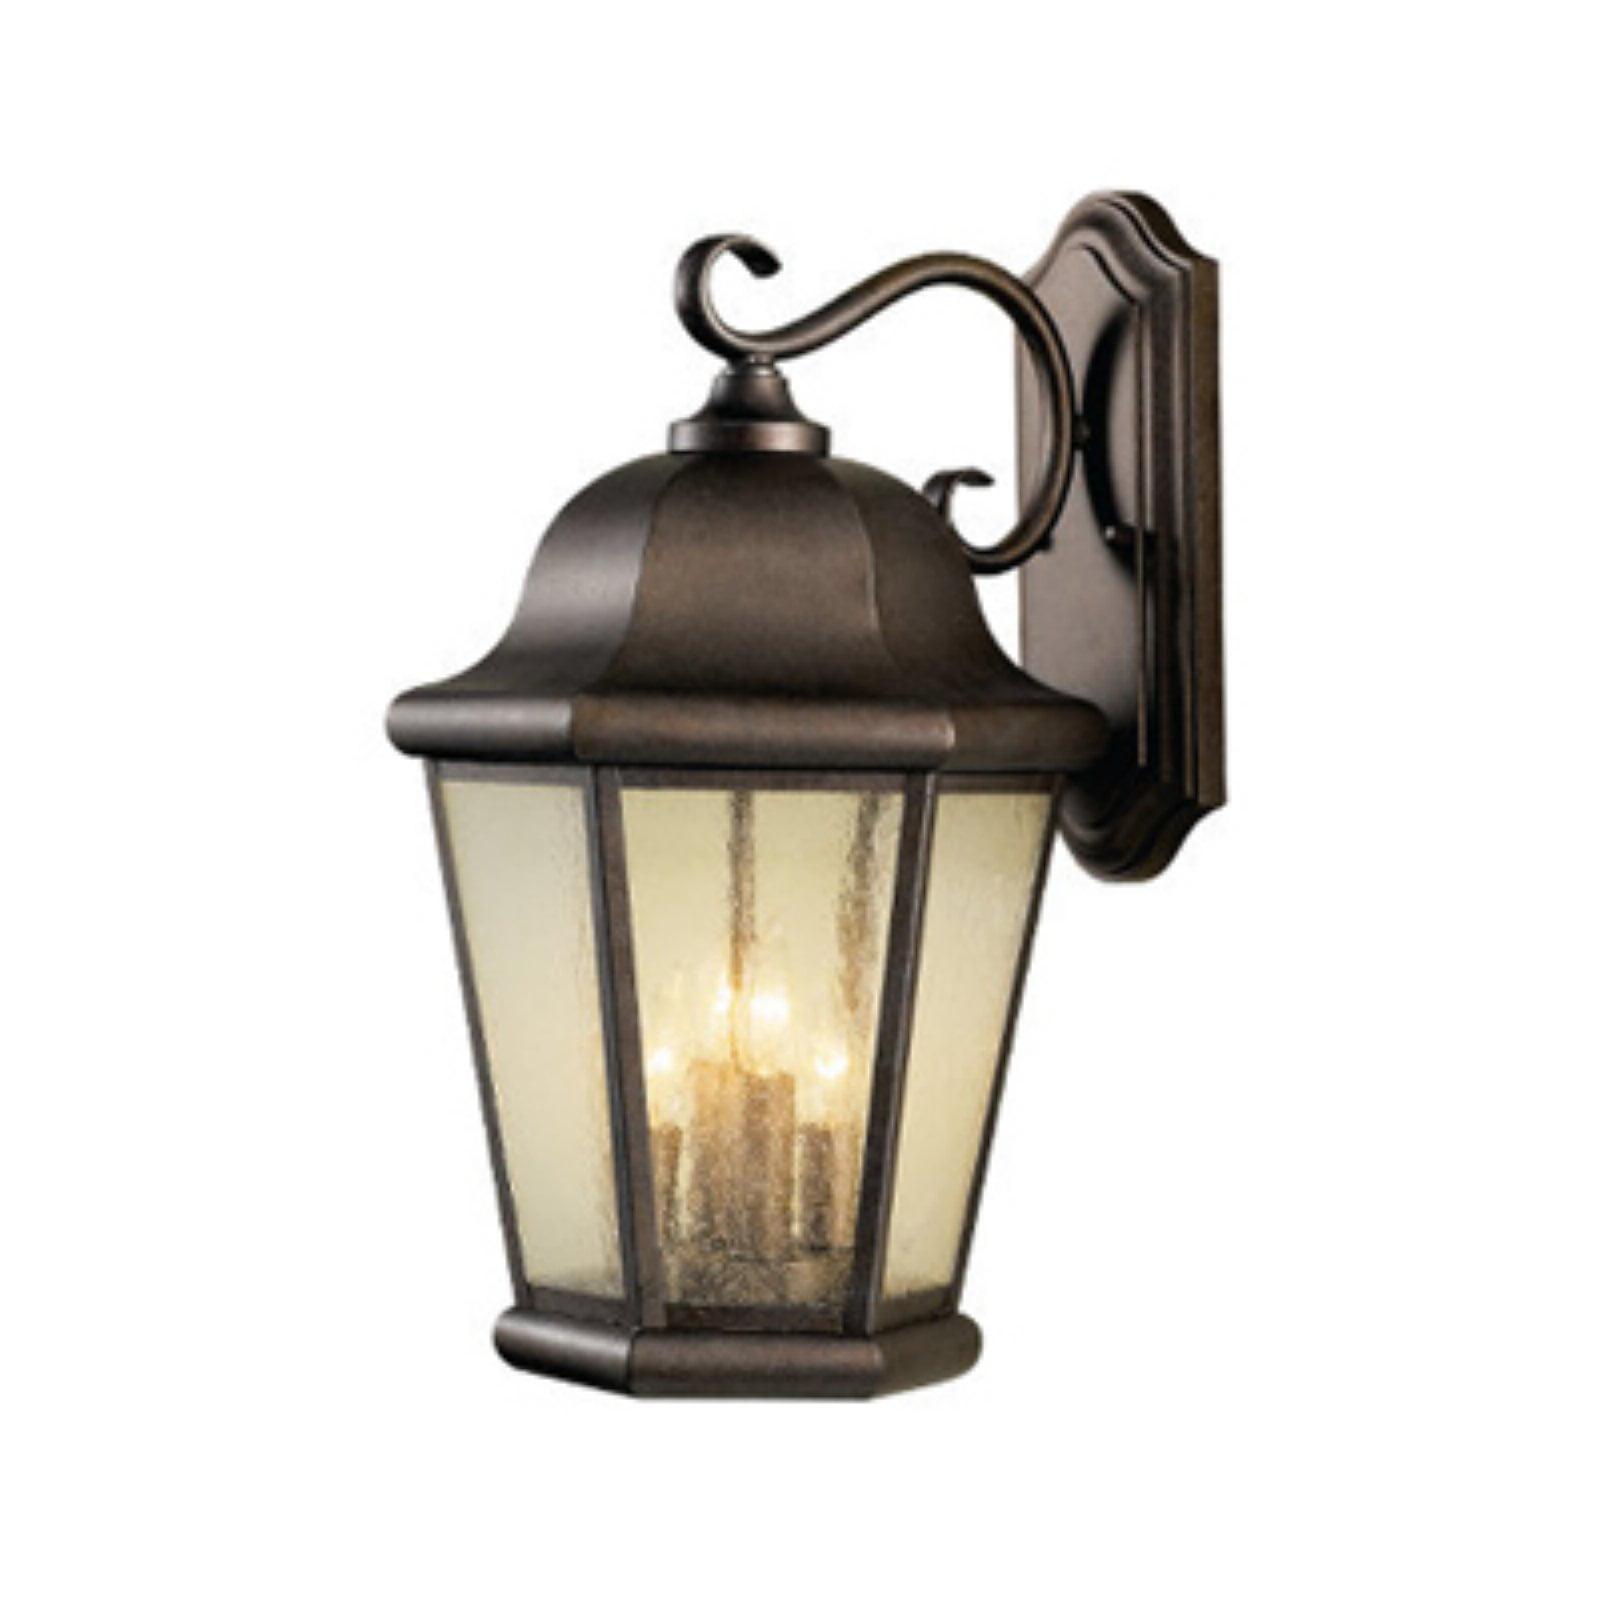 Feiss OL5900 Martinsville Outdoor Wall Lantern